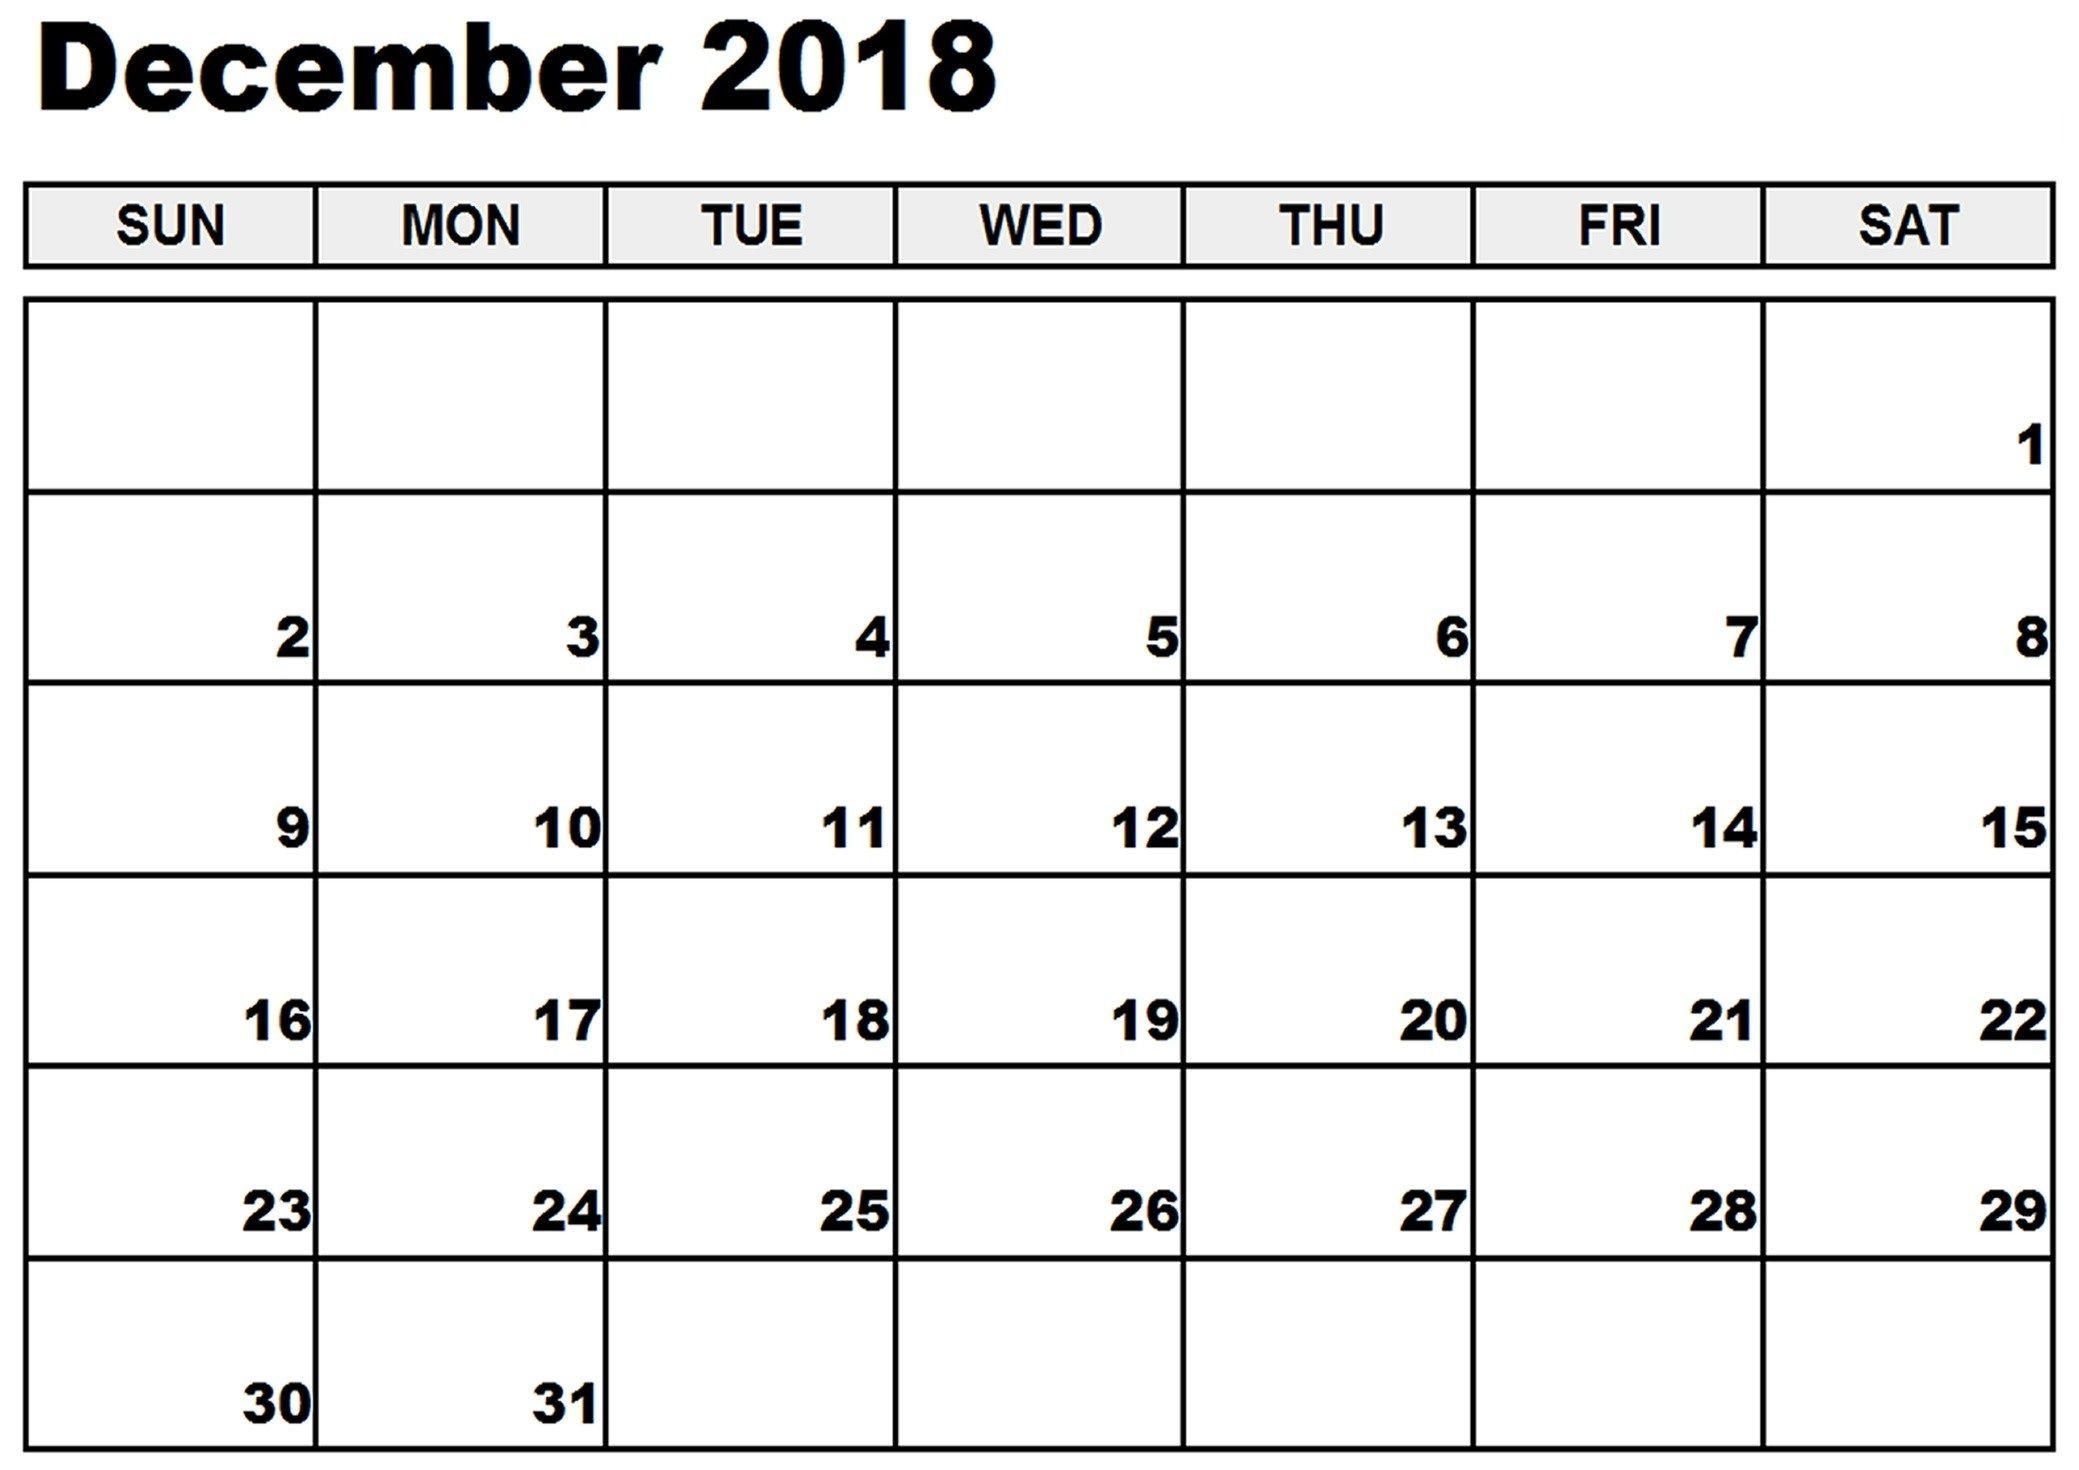 December 2018 Printable Calendar Notes To Do List Reminders for Blank December Calendar Printable